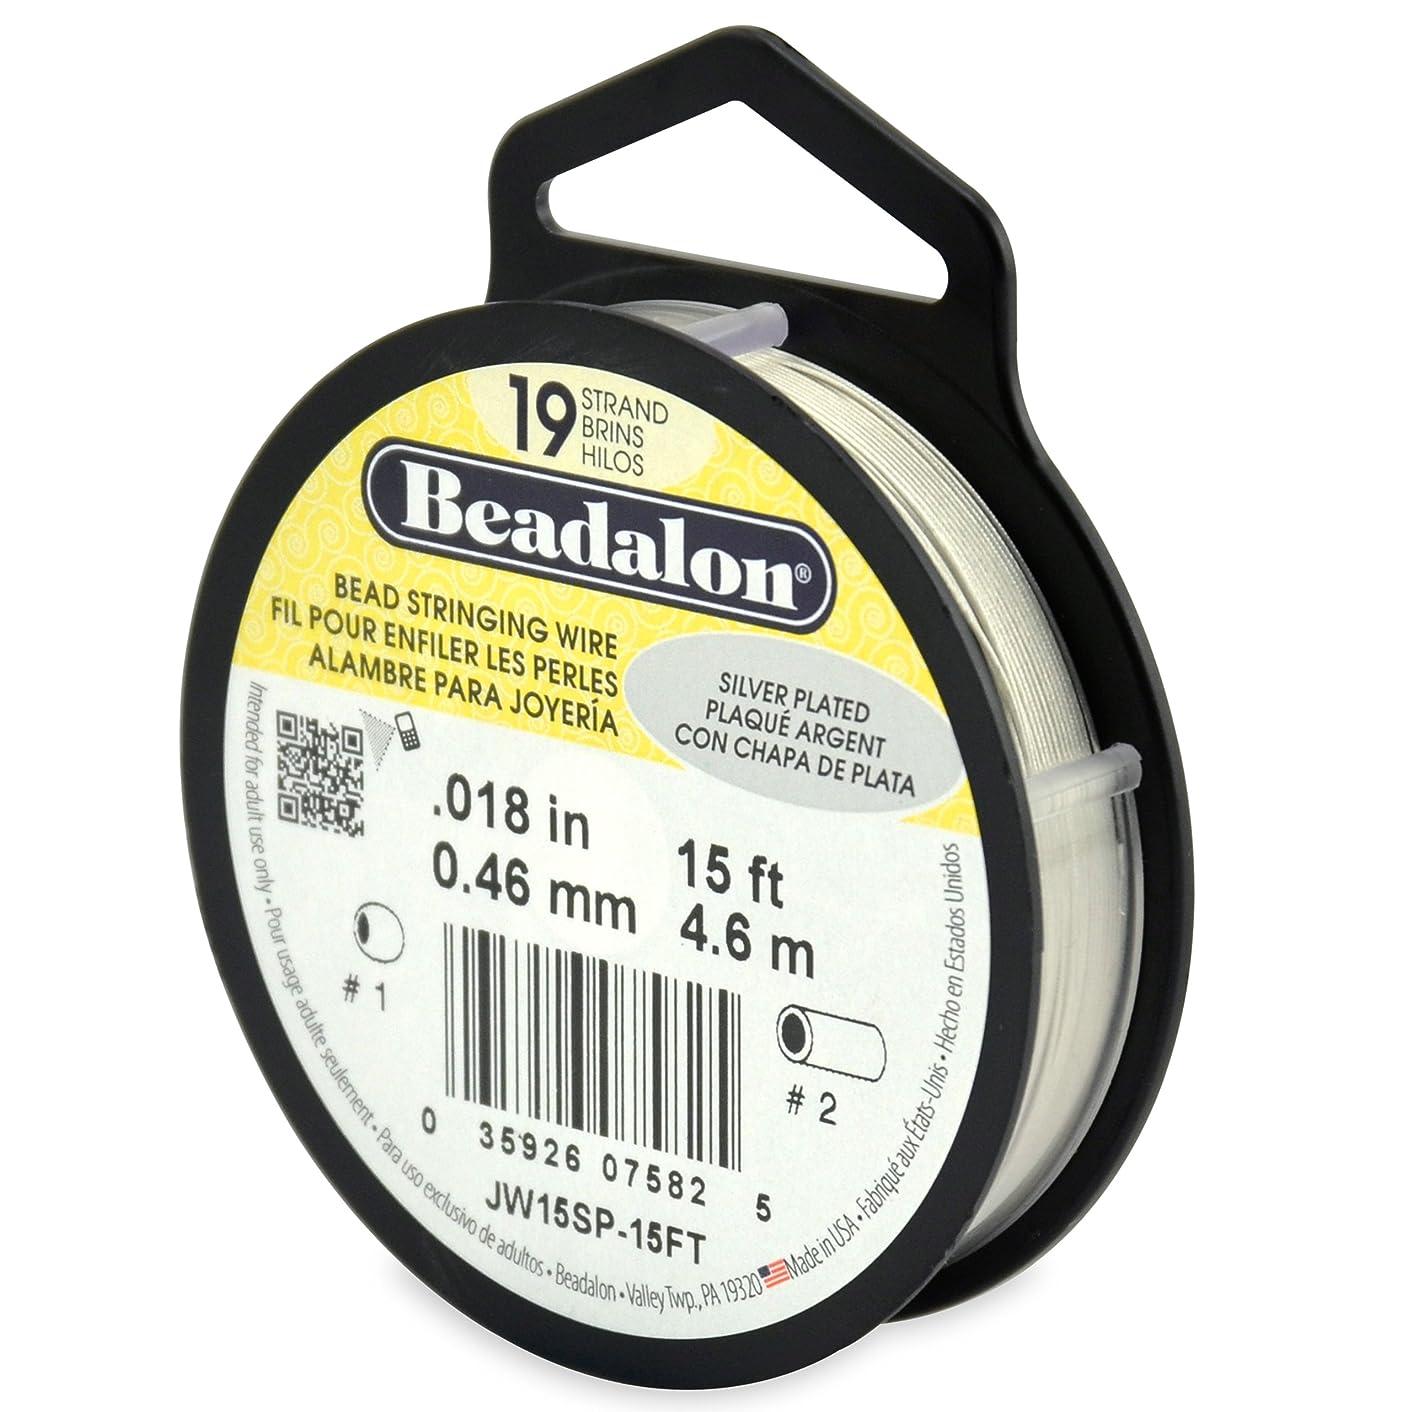 Beadalon 19-Strand Bead Stringing Wire, 0.018-Inch, Silver Plated, 15-Feet trnosdvh44013660